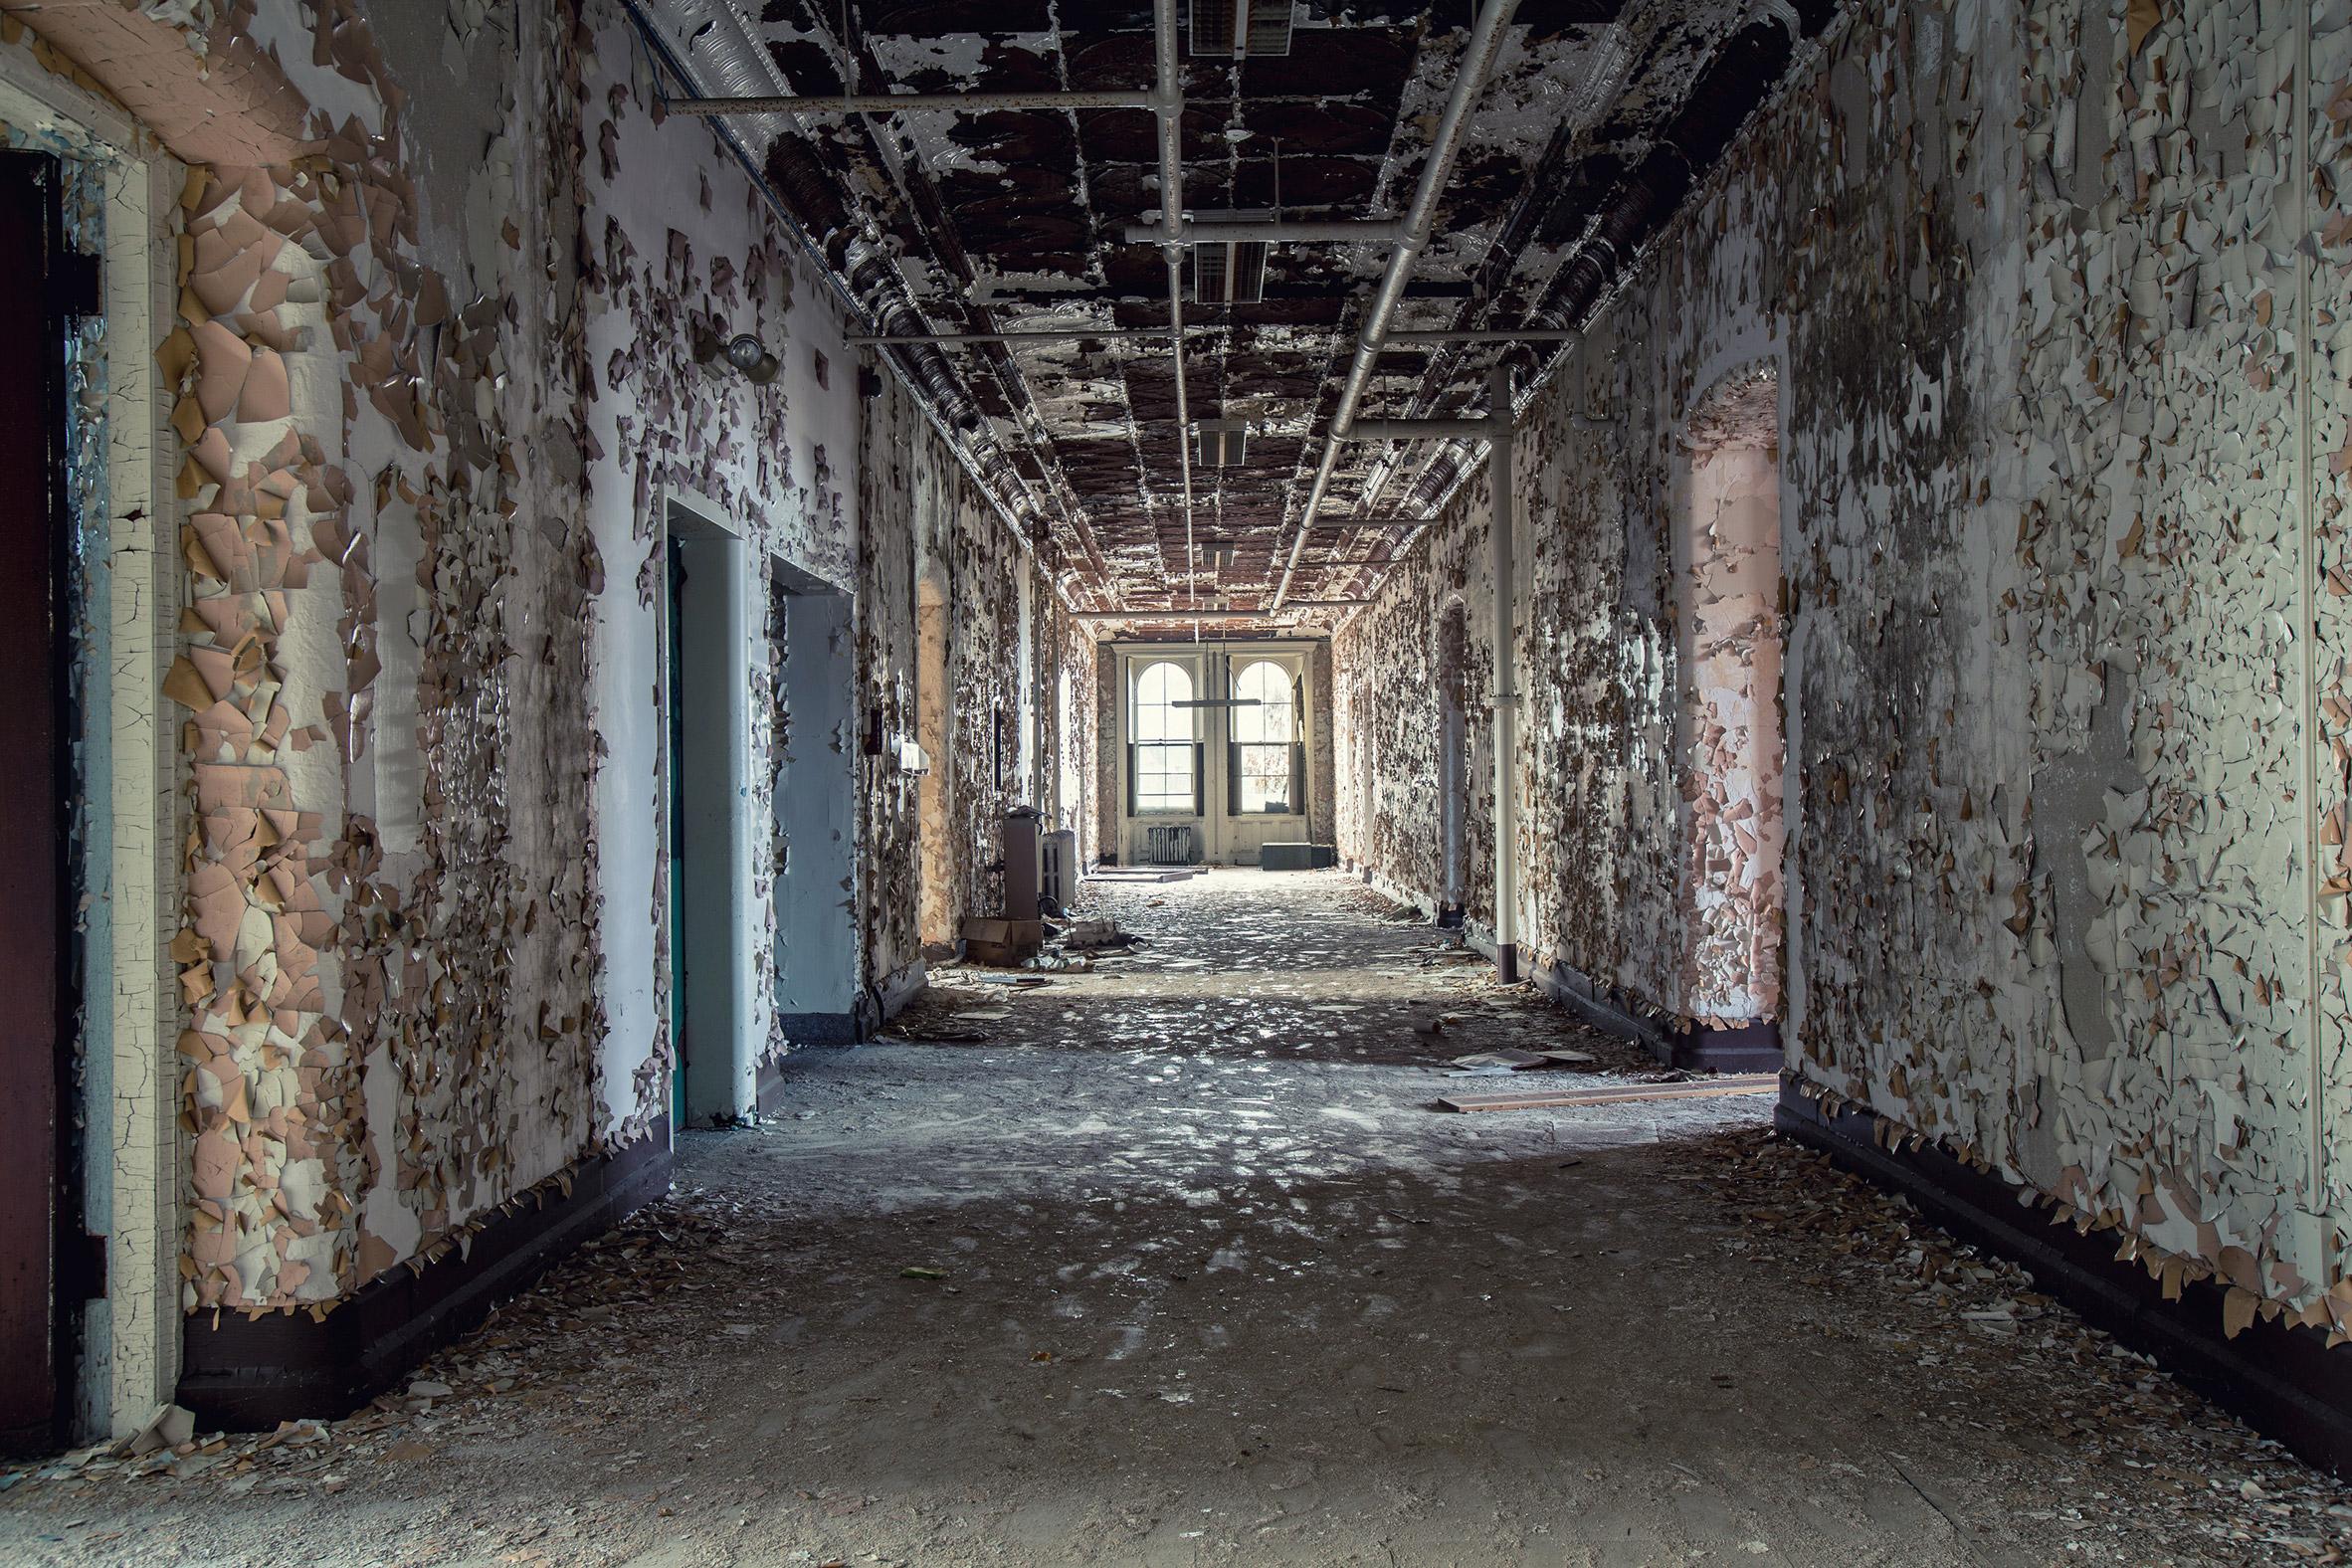 Matt Van Der Velde Photographs Abandoned Insane Asylums